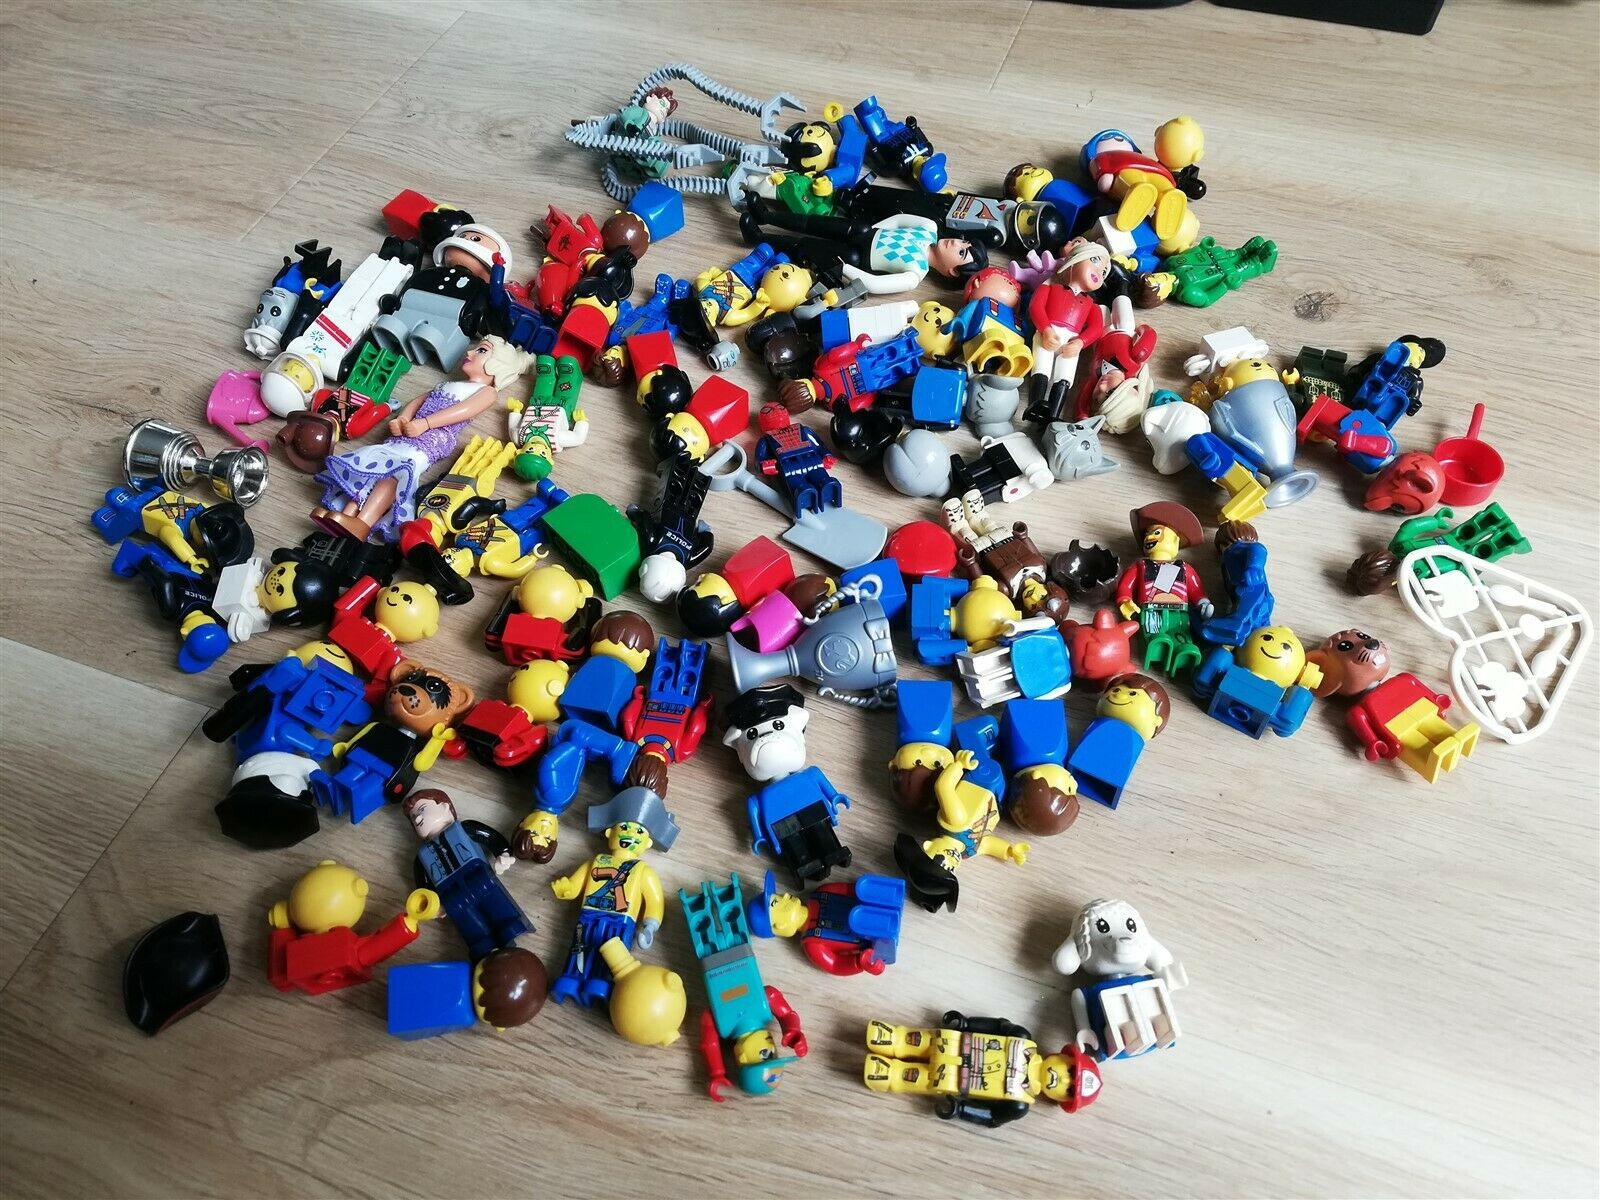 LEGO Bulk Lot Fabuland, Vintage, maxifig, creator figures and more